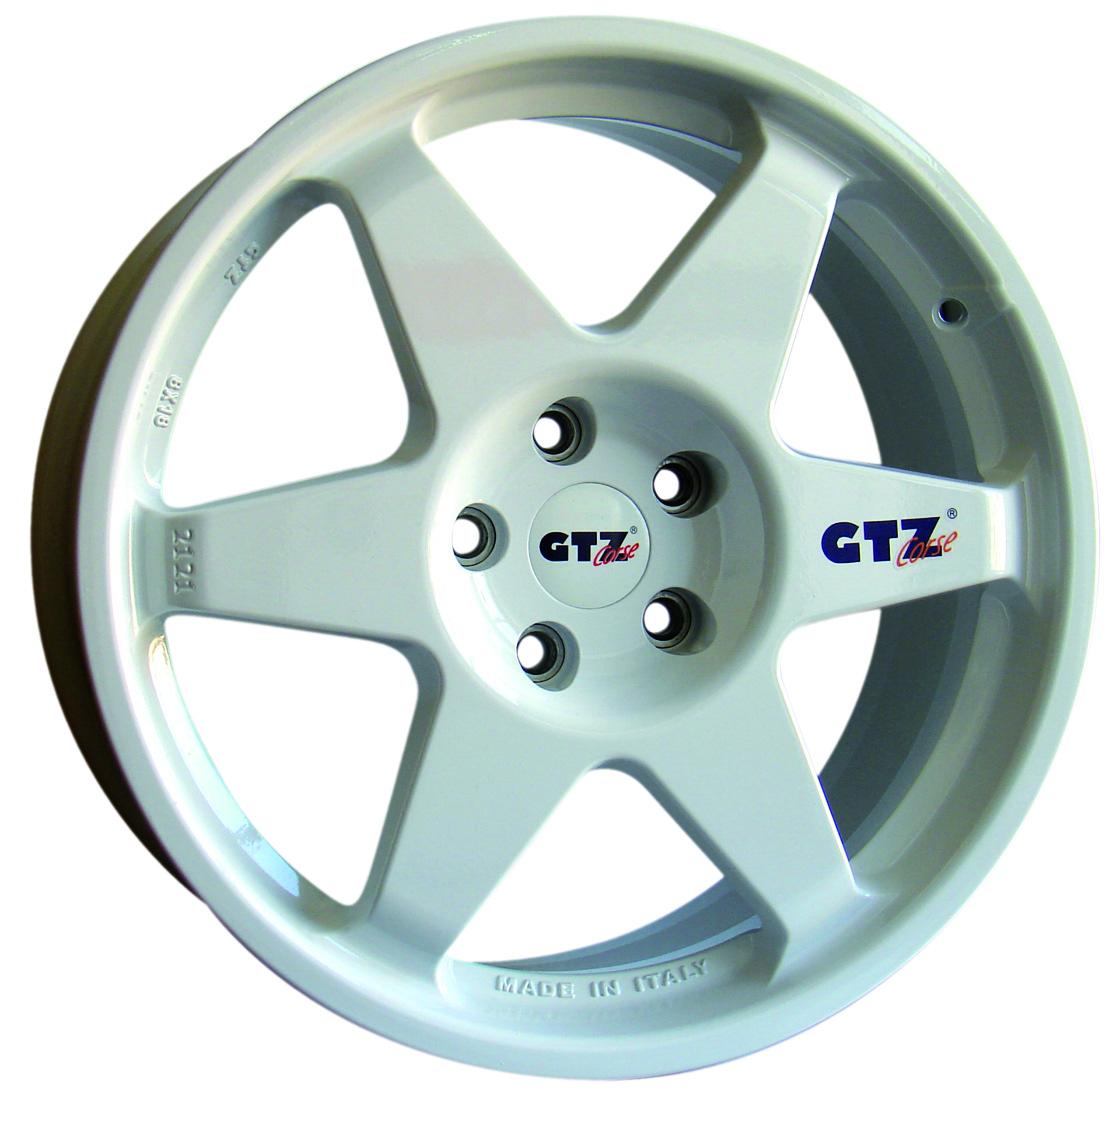 SPEEDLINE CORSE GTZ type 2121 8x18 5x114.3 ET25 WHITE